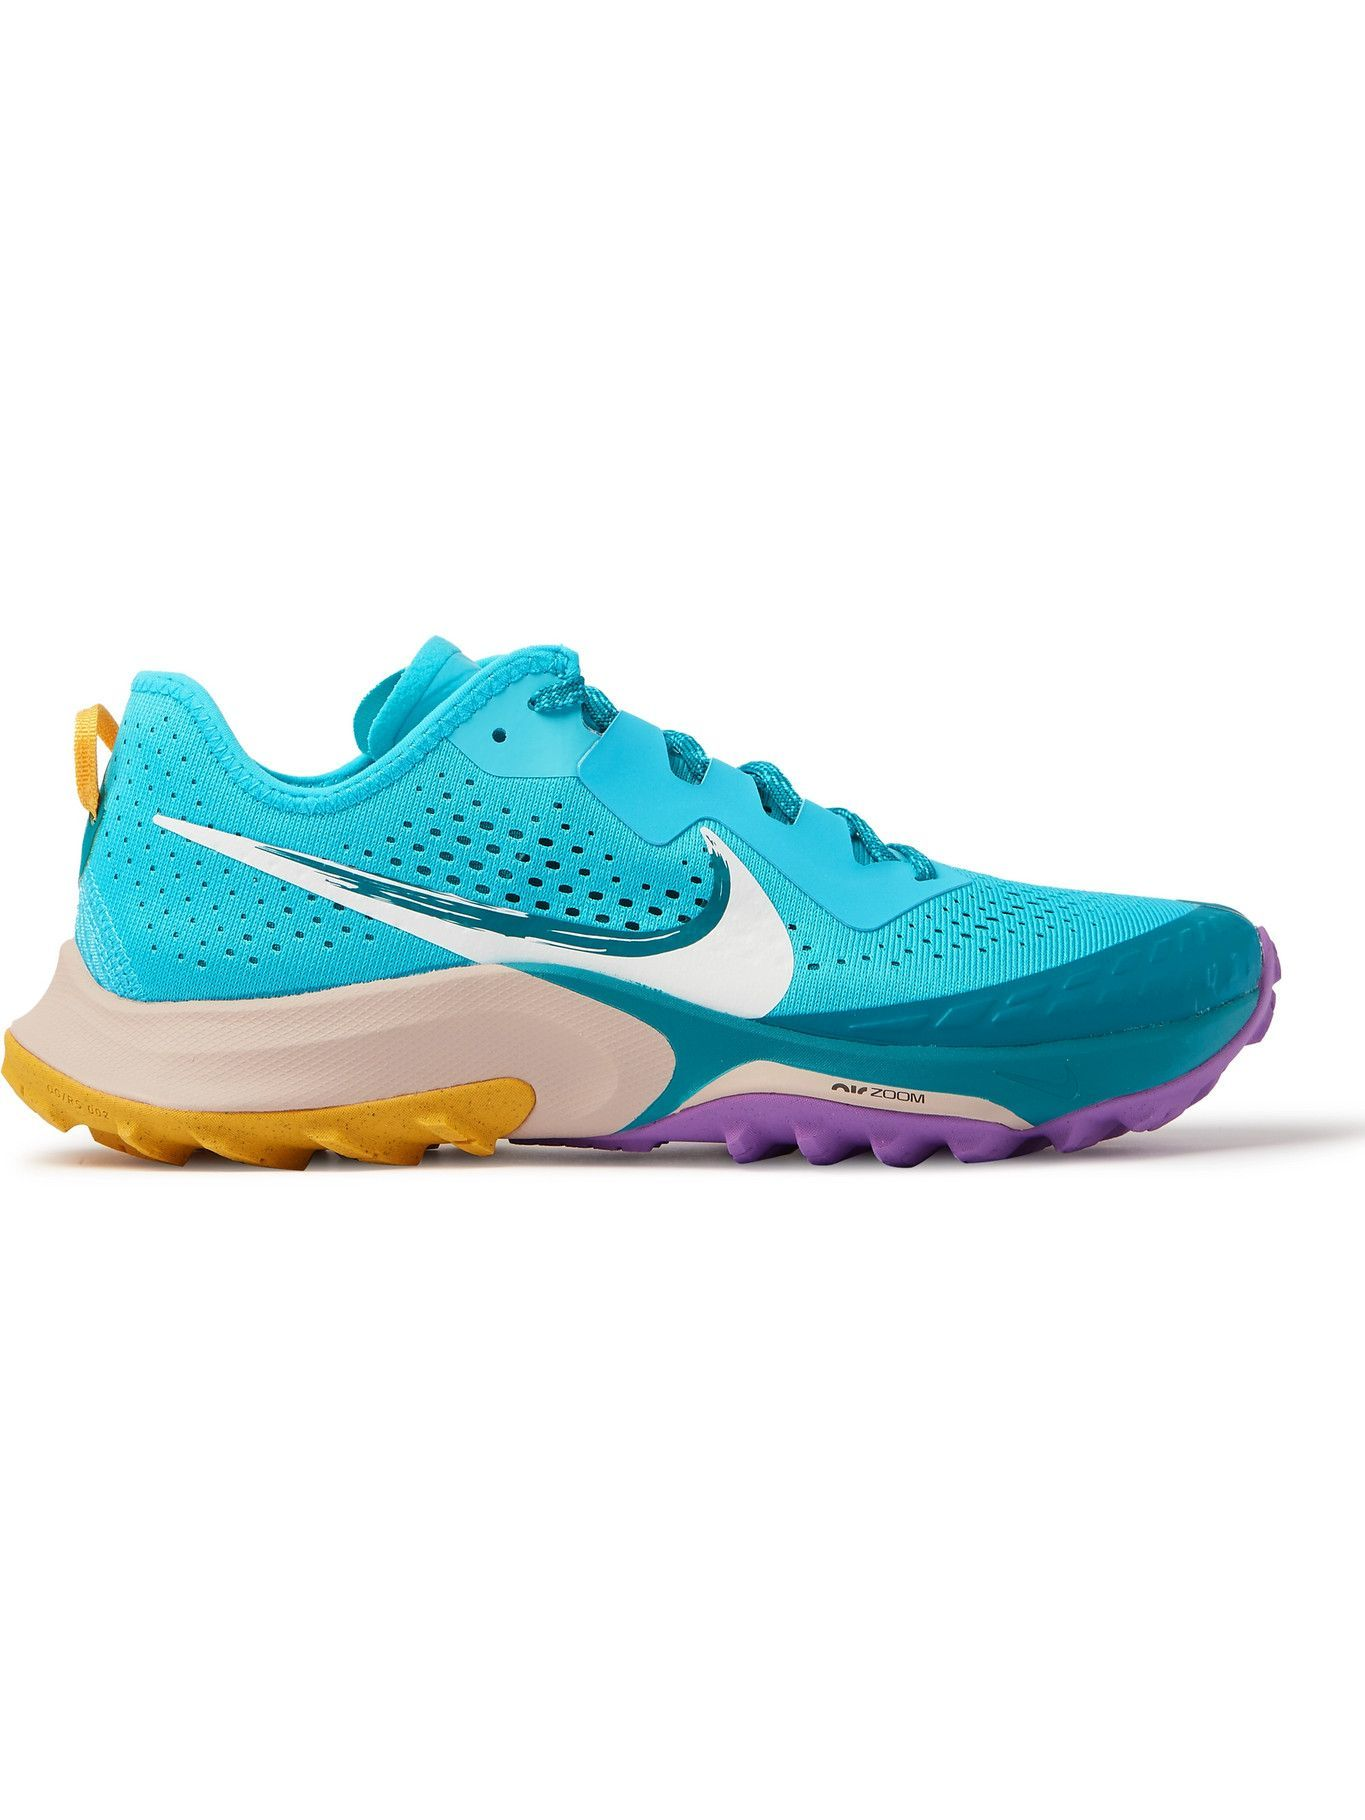 NIKE RUNNING - Air Zoom Terra Kiger 7 Rubber-Trimmed Mesh Running Sneakers - Blue